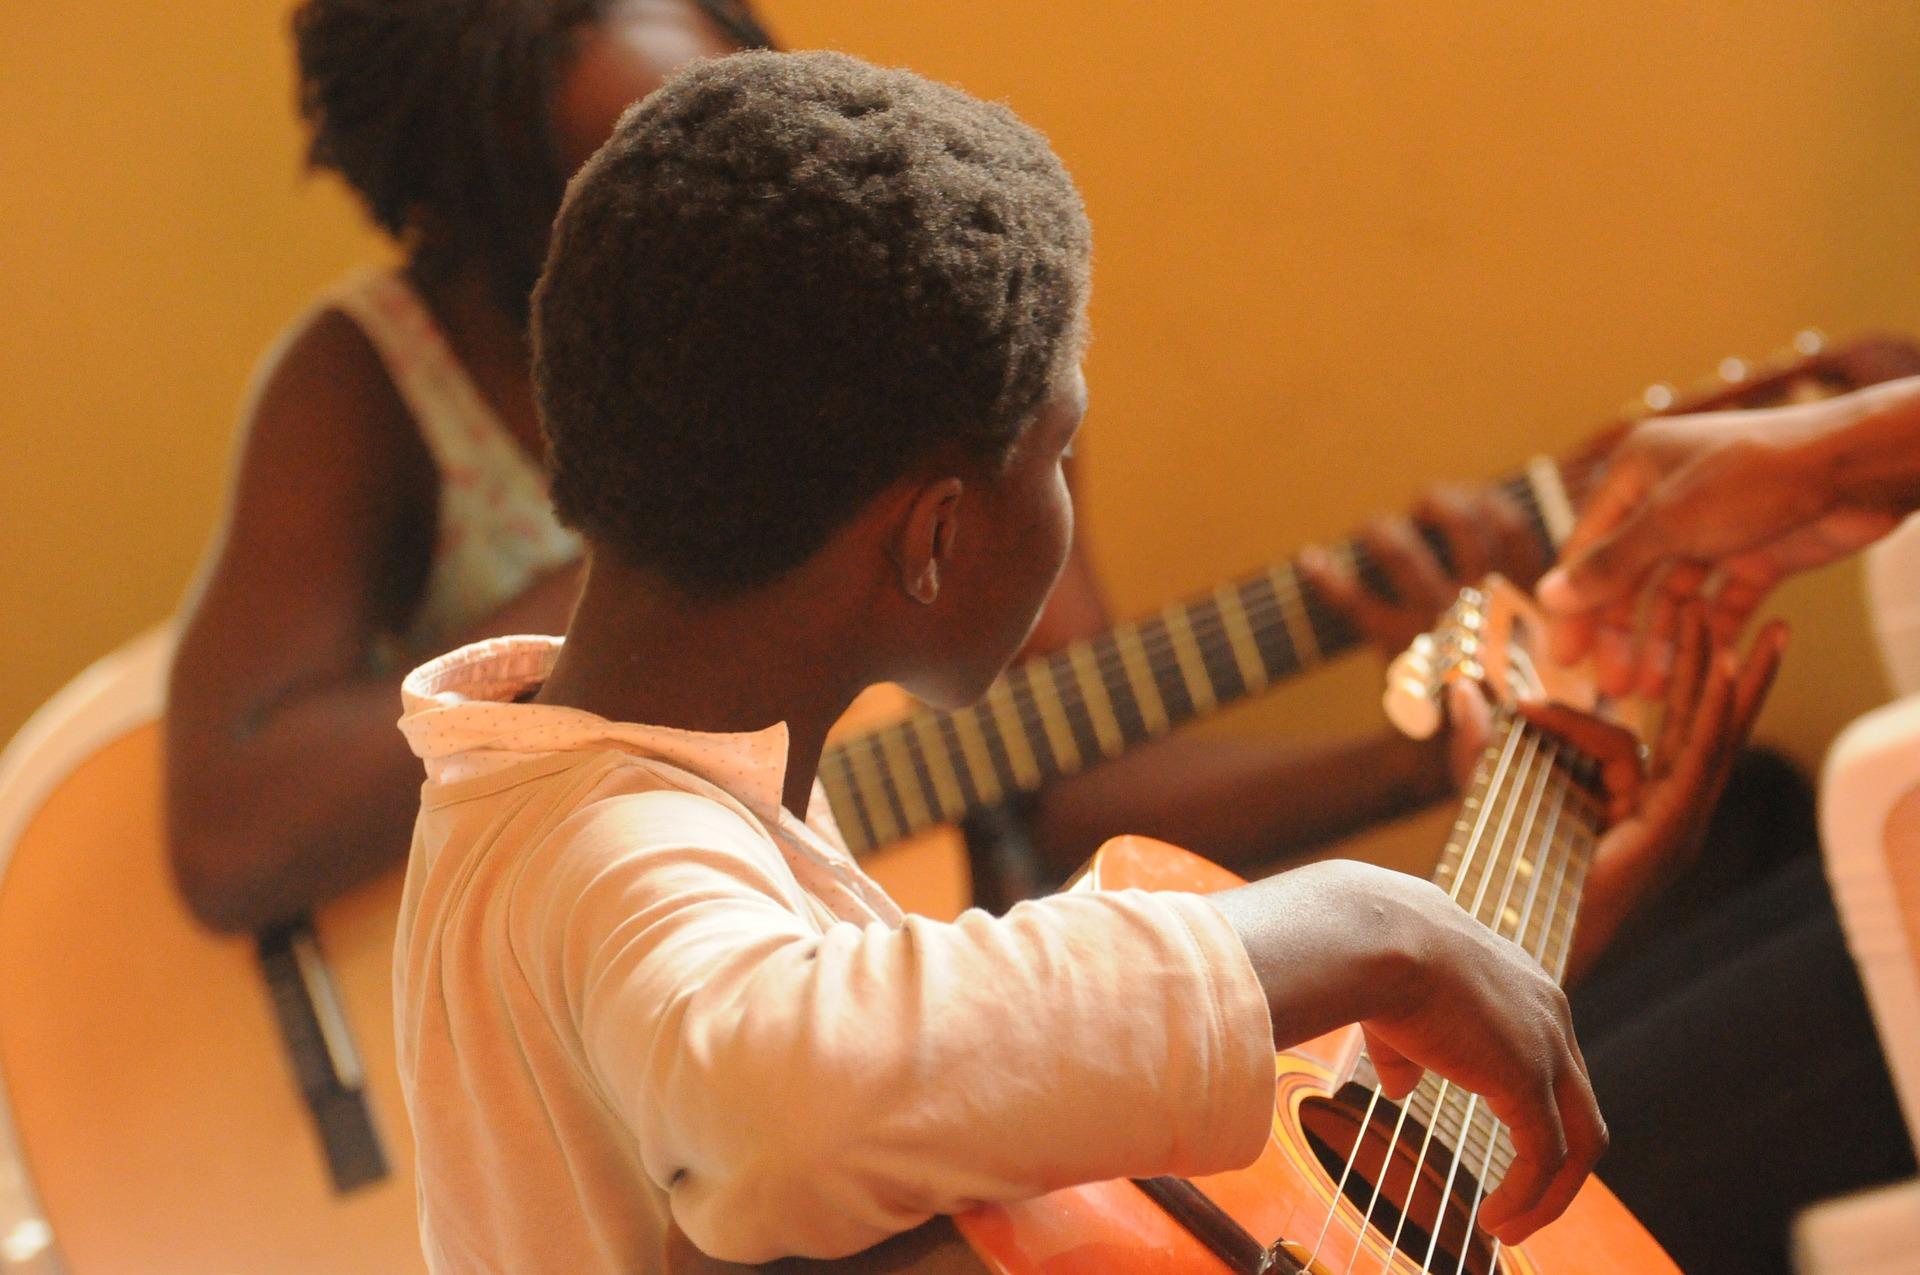 school-of-music-435096_1920.jpg